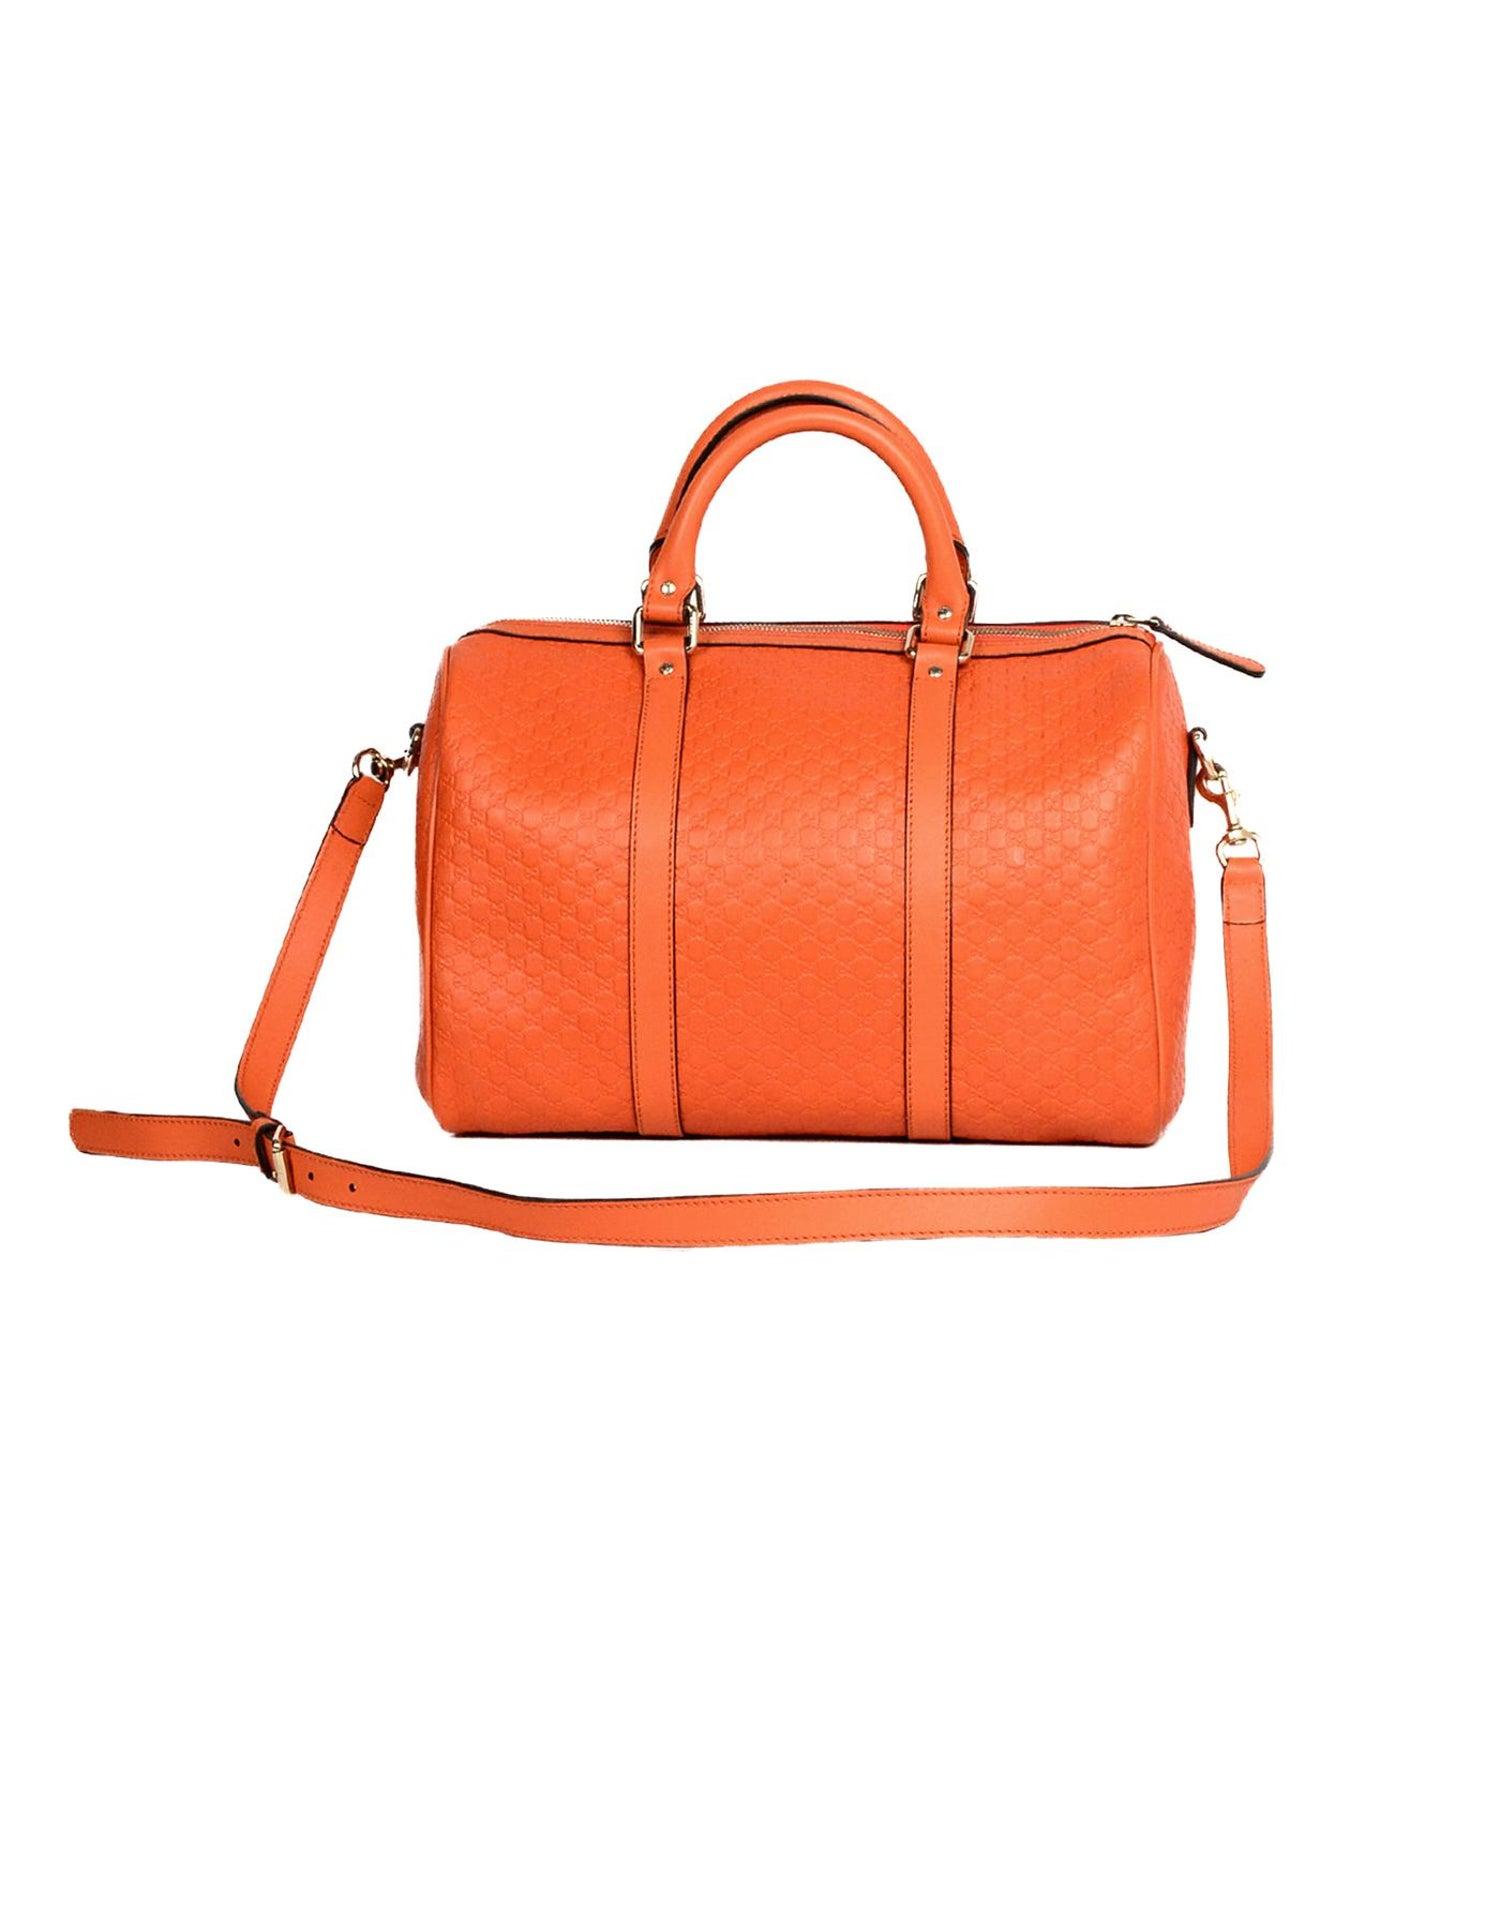 30ef456168a5 Gucci Orange GG Monogram Microguccissima Leather Medium Joy Boston Bag W/  Strap For Sale at 1stdibs